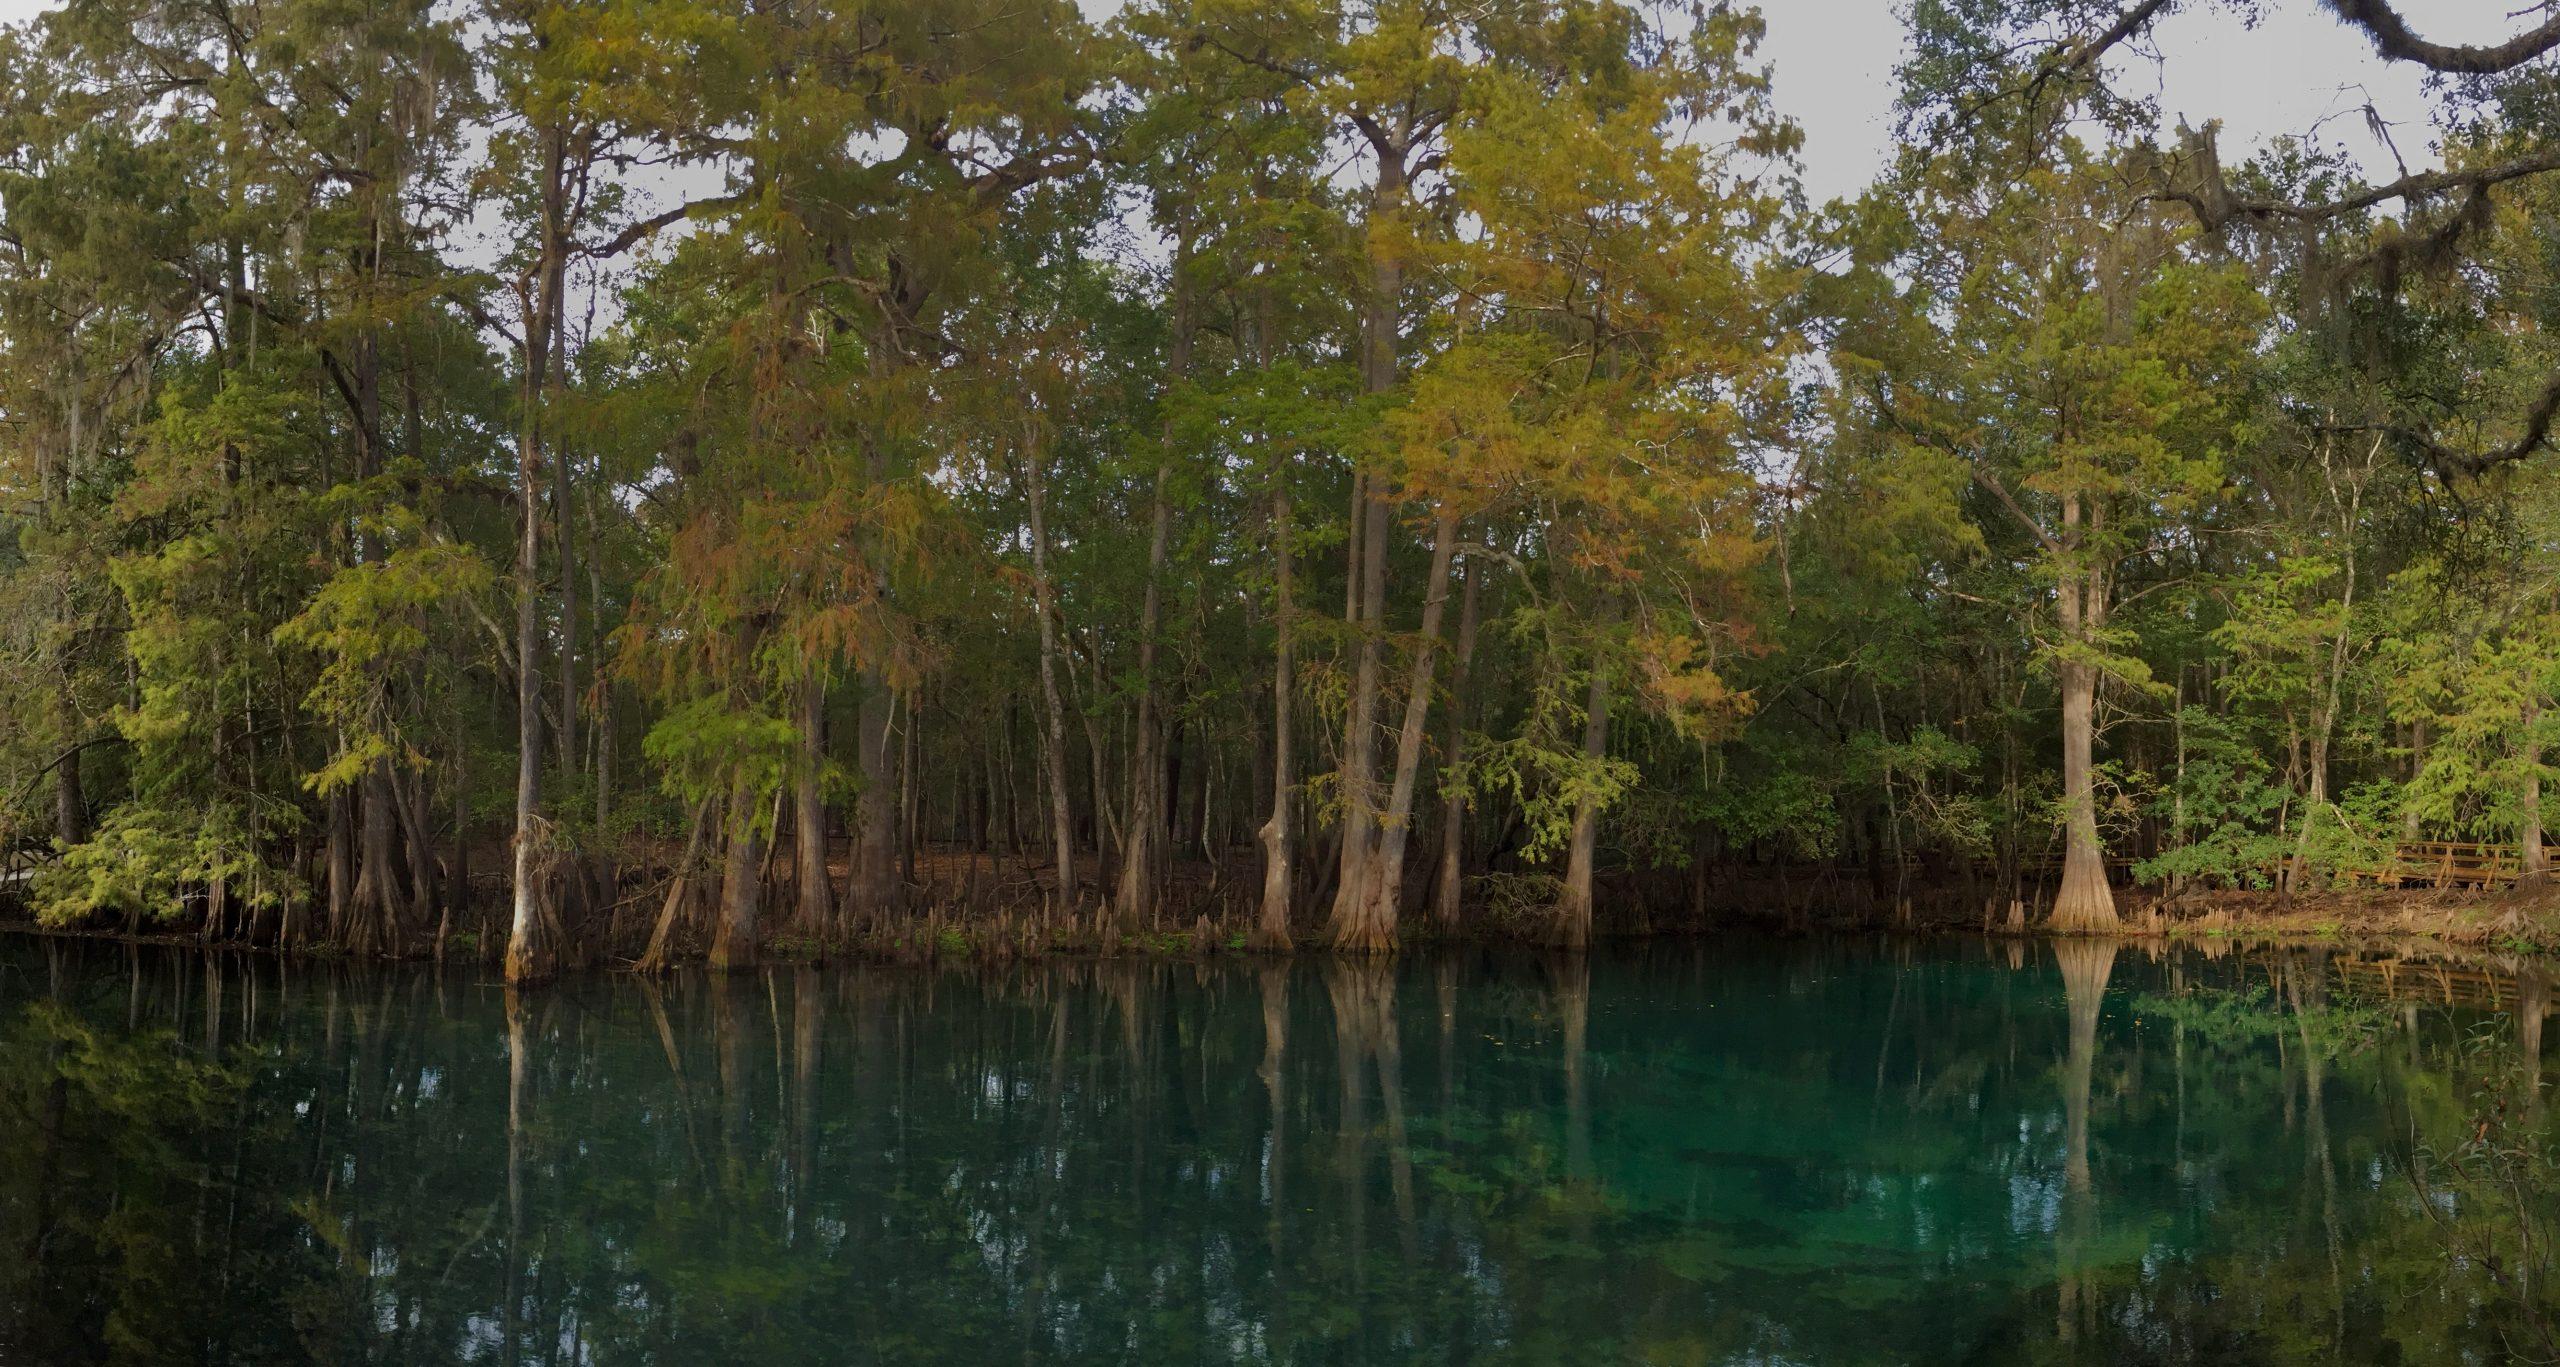 cypress trees grow alongside the water of manatee springs